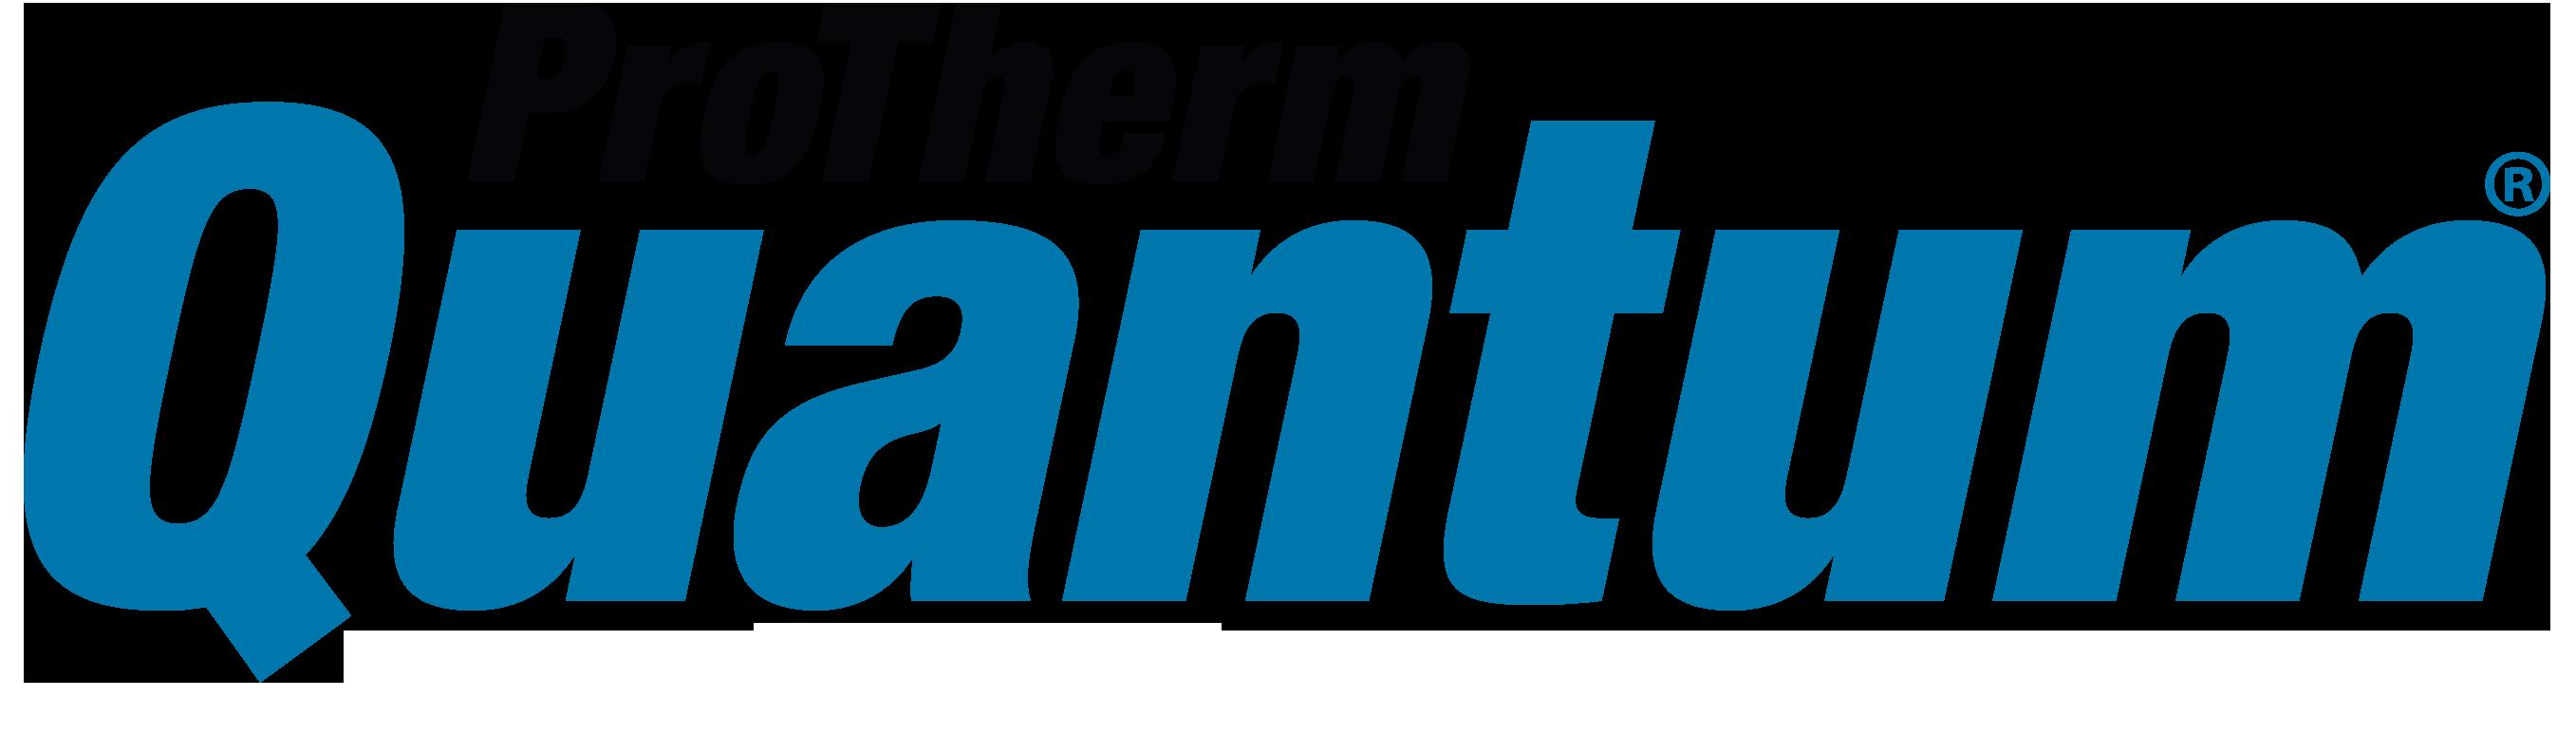 ProTherm-Quantum-logo_RGB